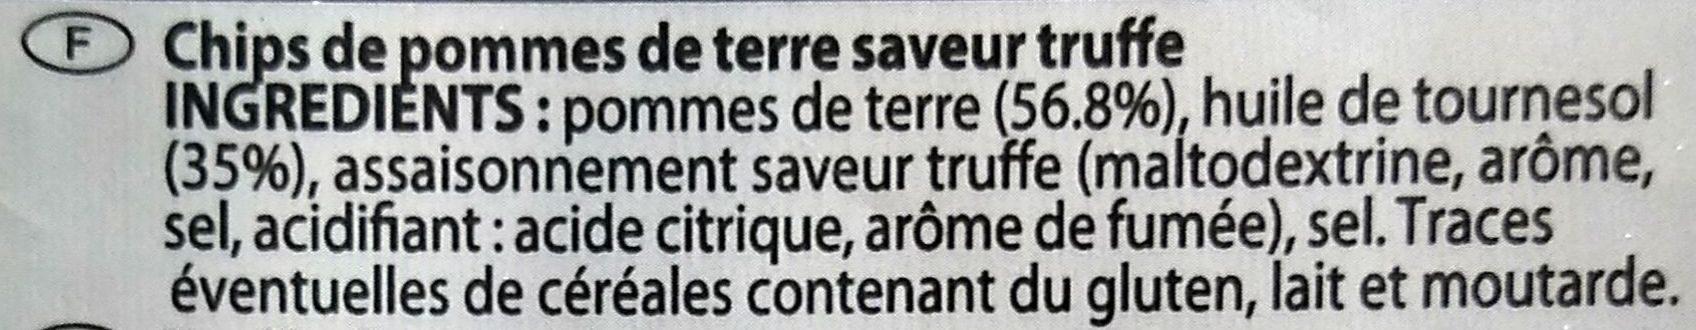 Chips saveur Truffe - Ingrédients - fr